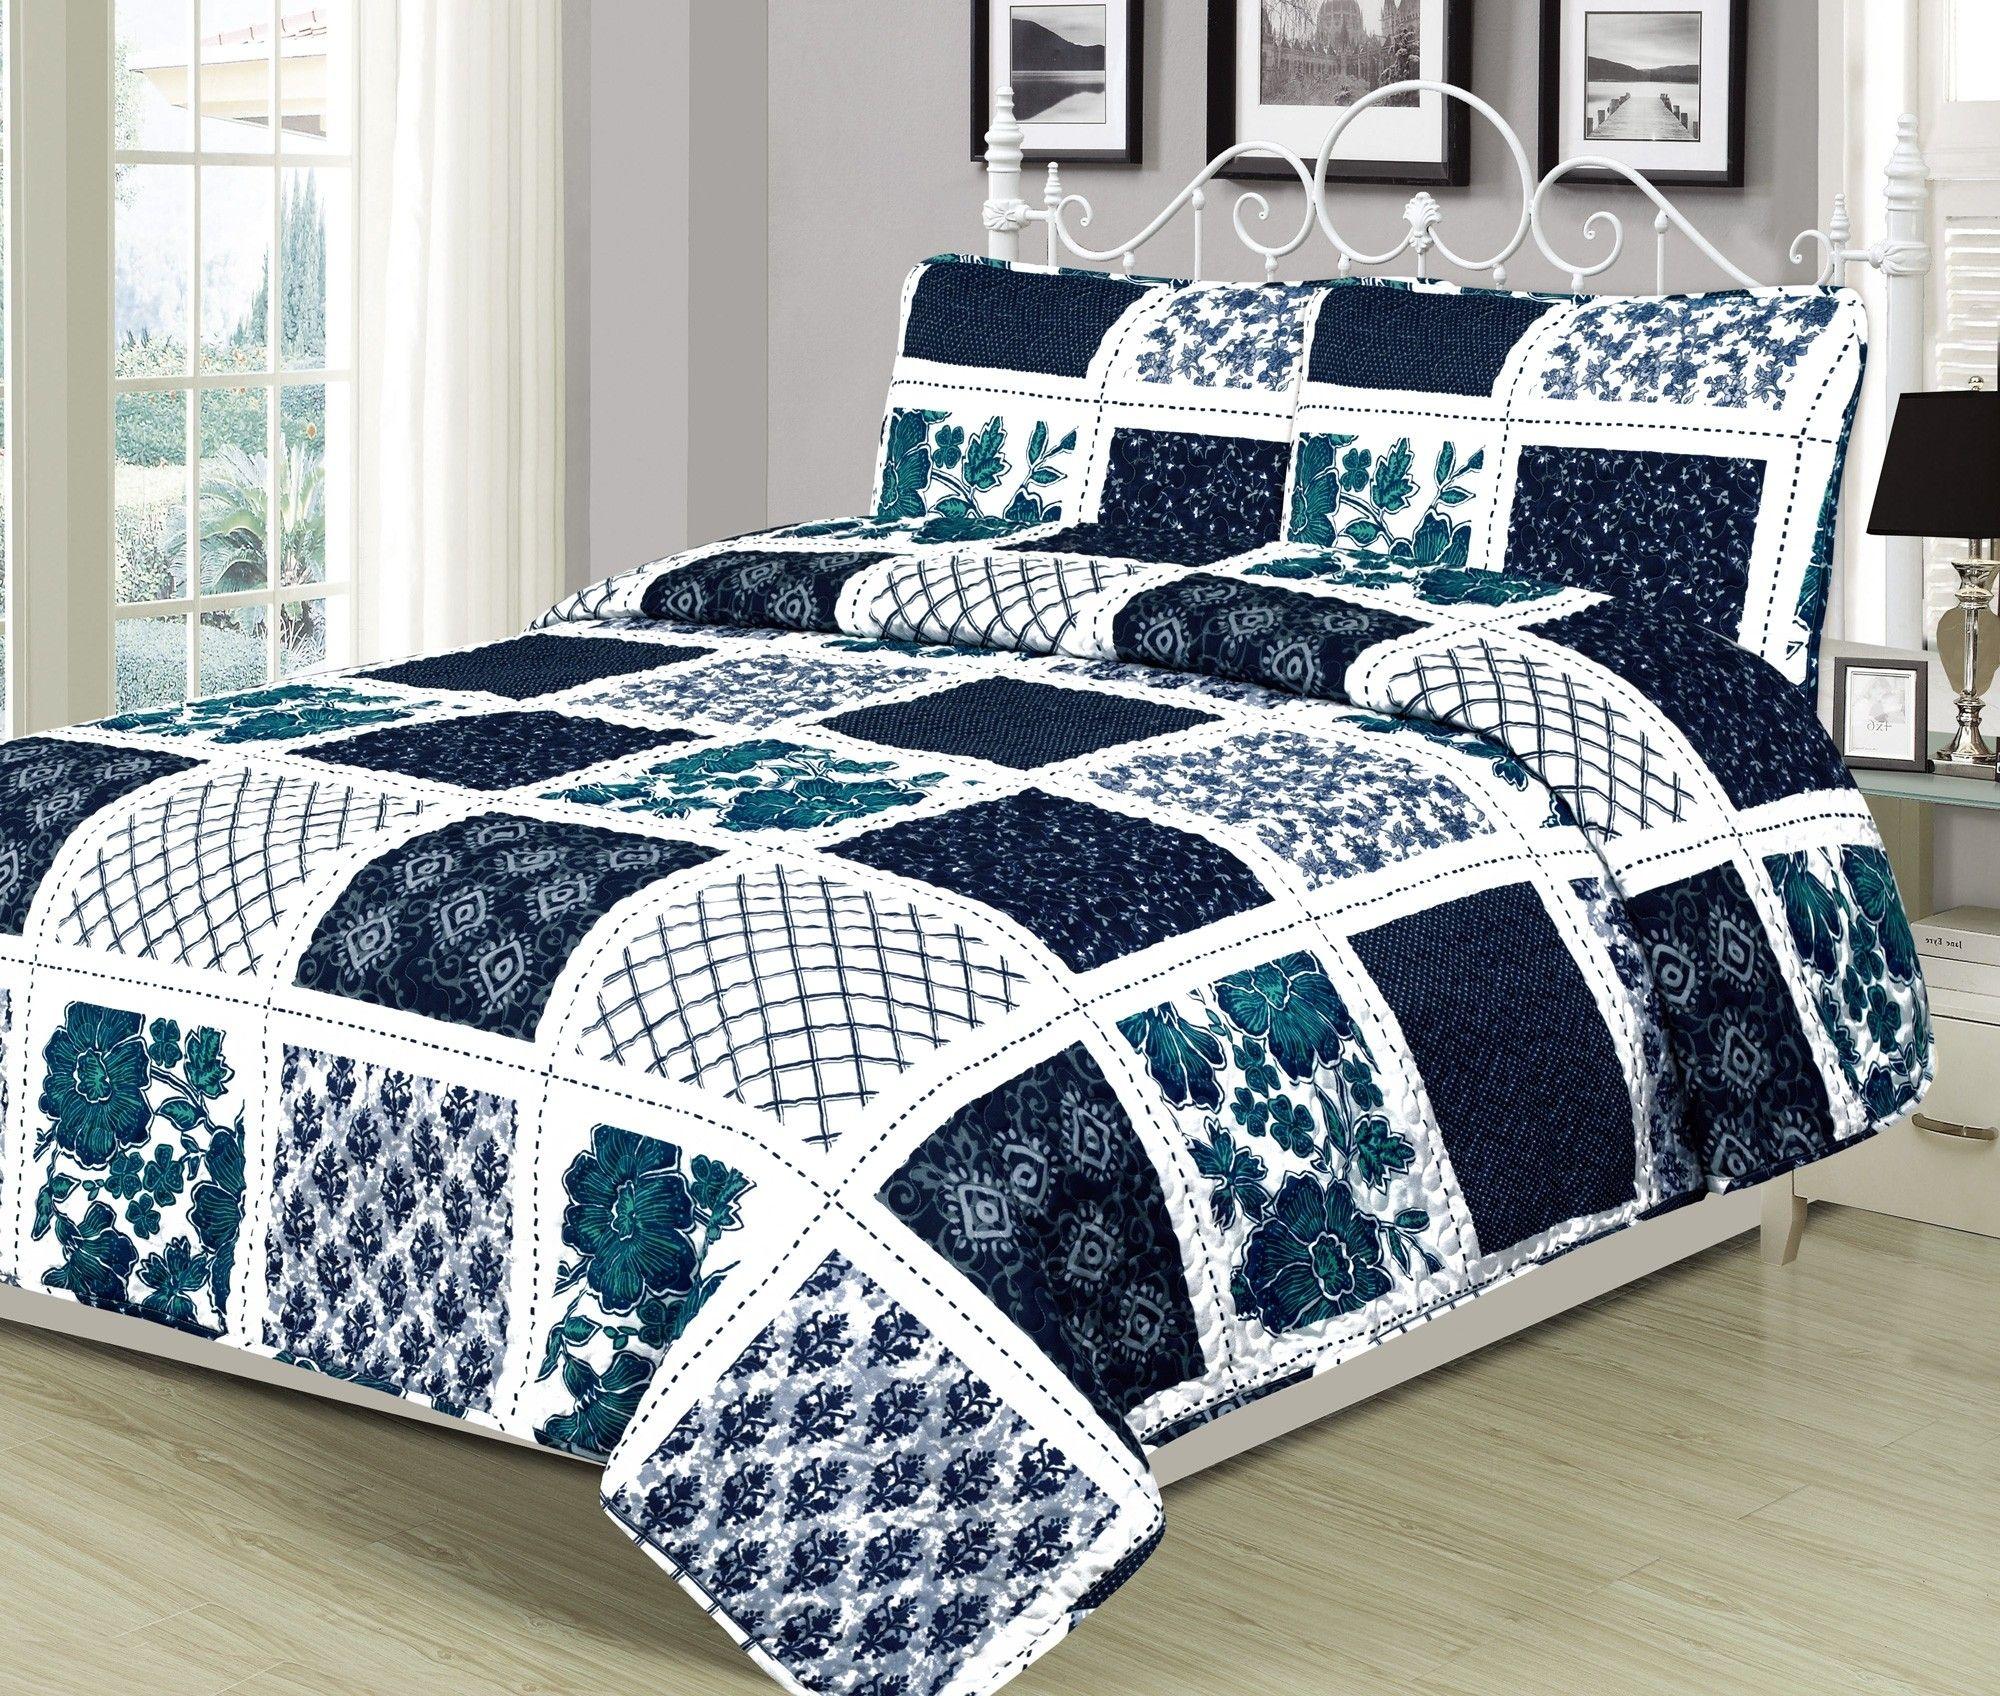 Twin Full Queen King Bed Blue White Polka Dot Reversible 3 pc Quilt Coverlet Set